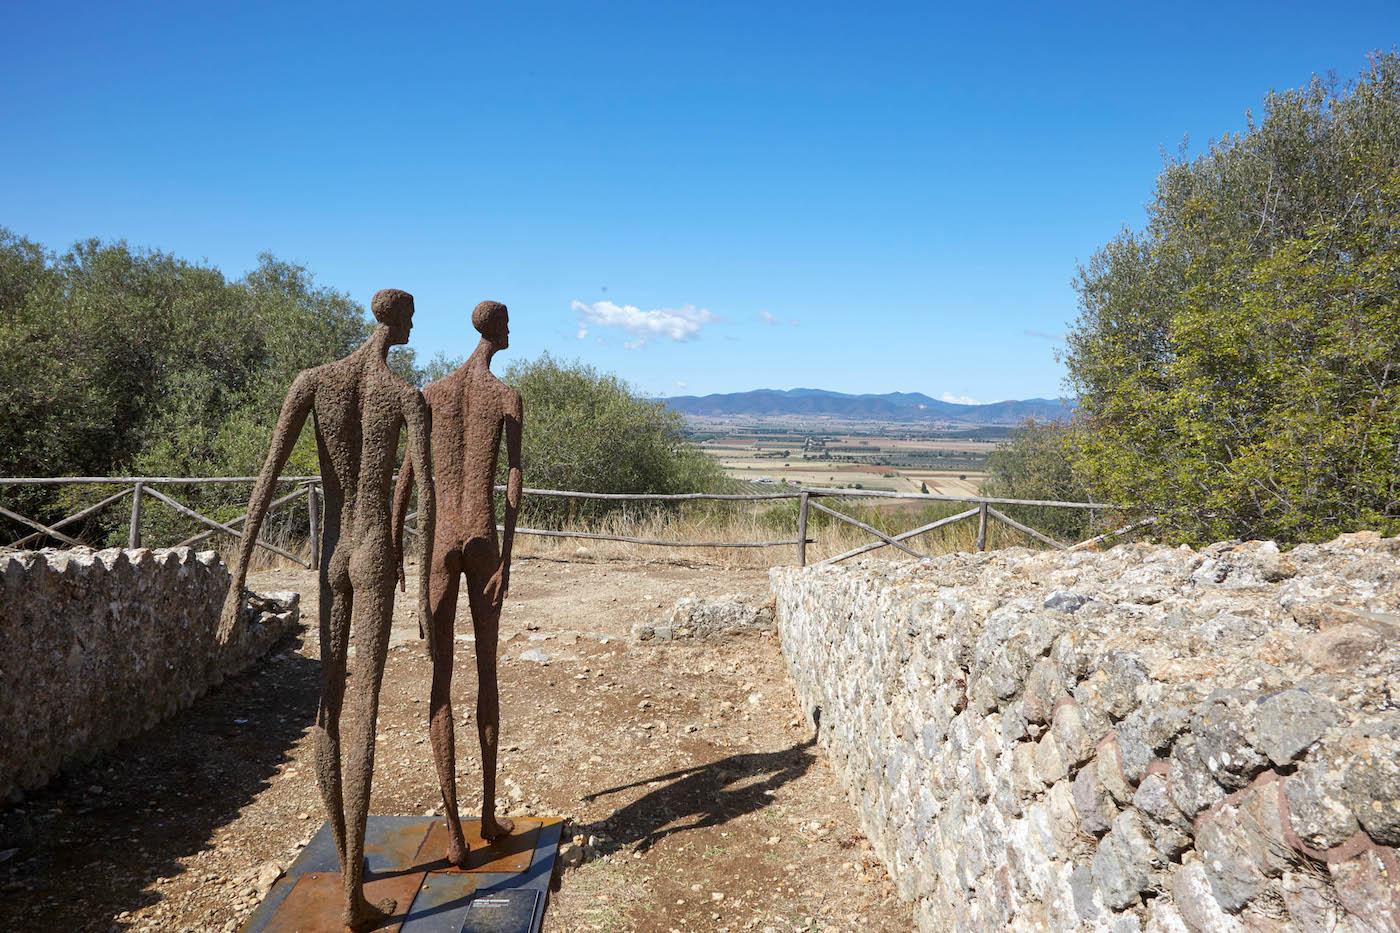 Area Archeologica di Roselle (GR), ZONA 16. Gerard Moroder Forever Never Comes. Foto: Carlo Bonazza